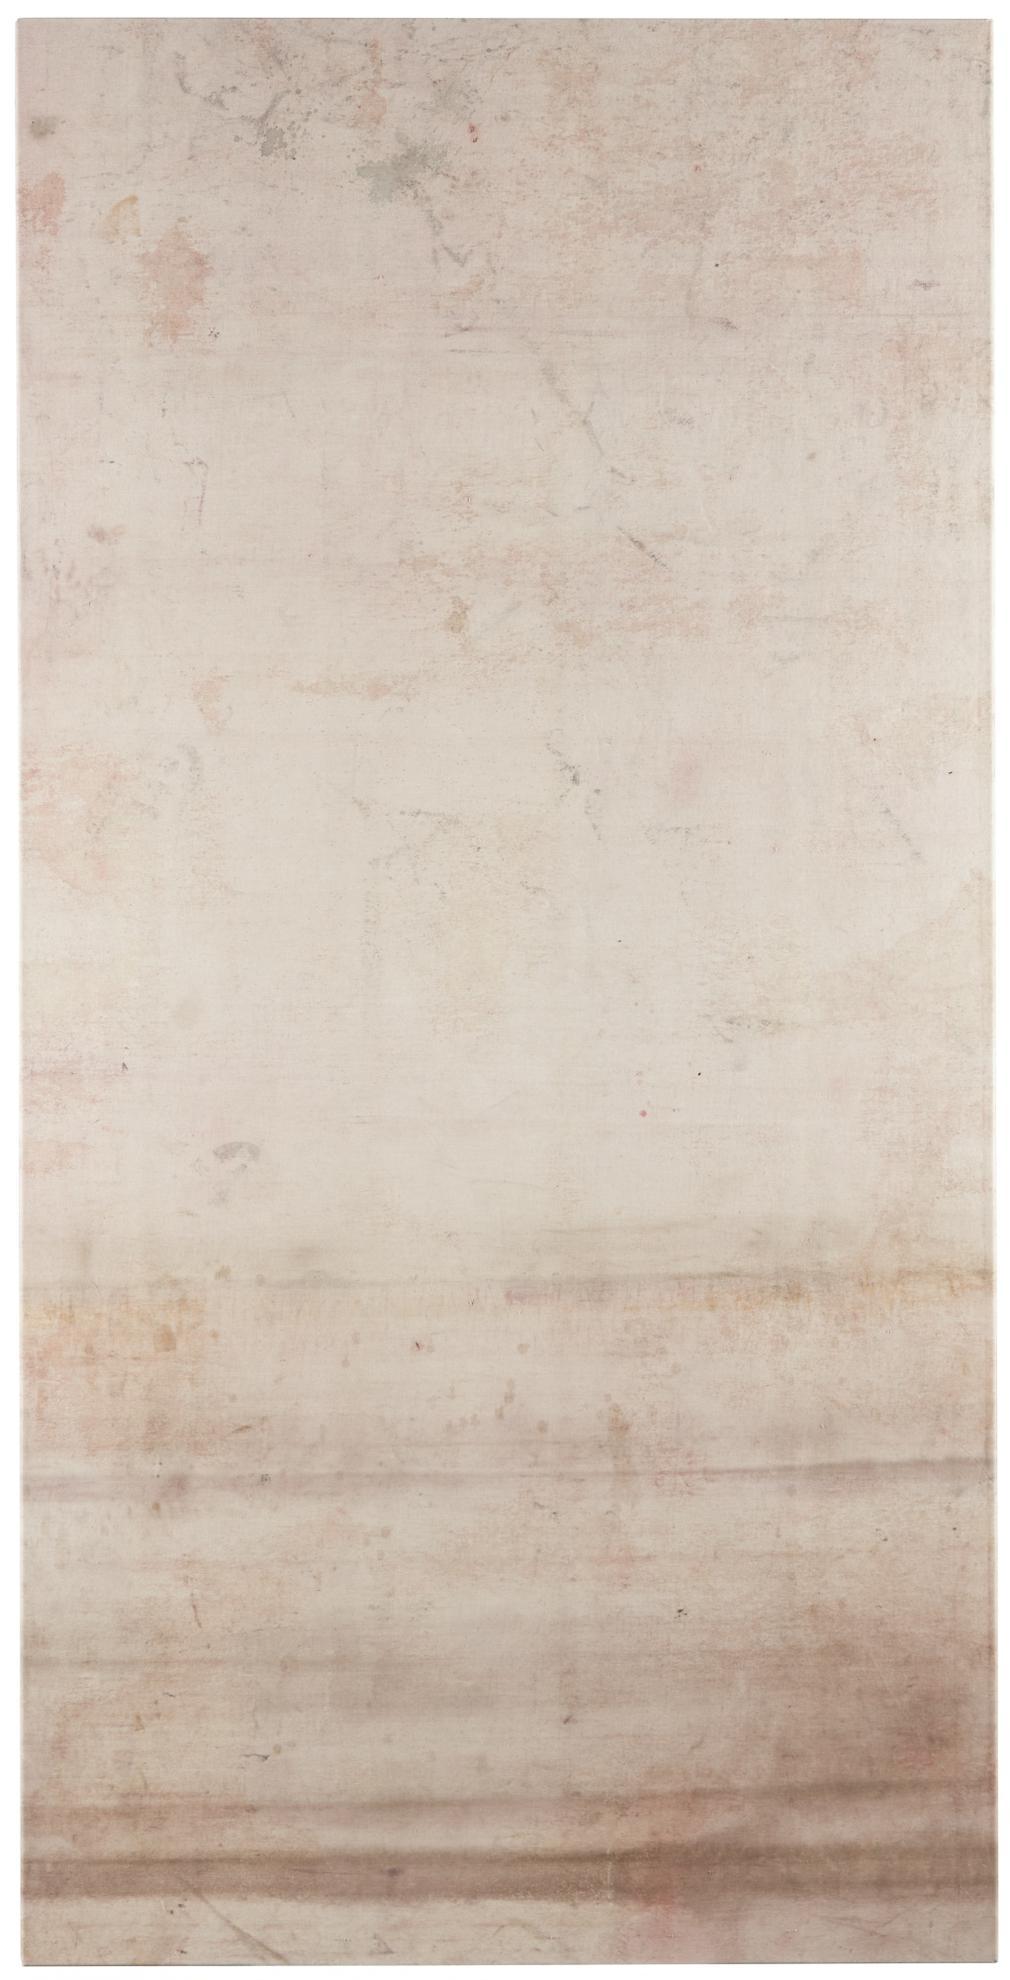 Fredrik Vaerslev-Untitled (Canopy Painting: Red Monochrome)-2012